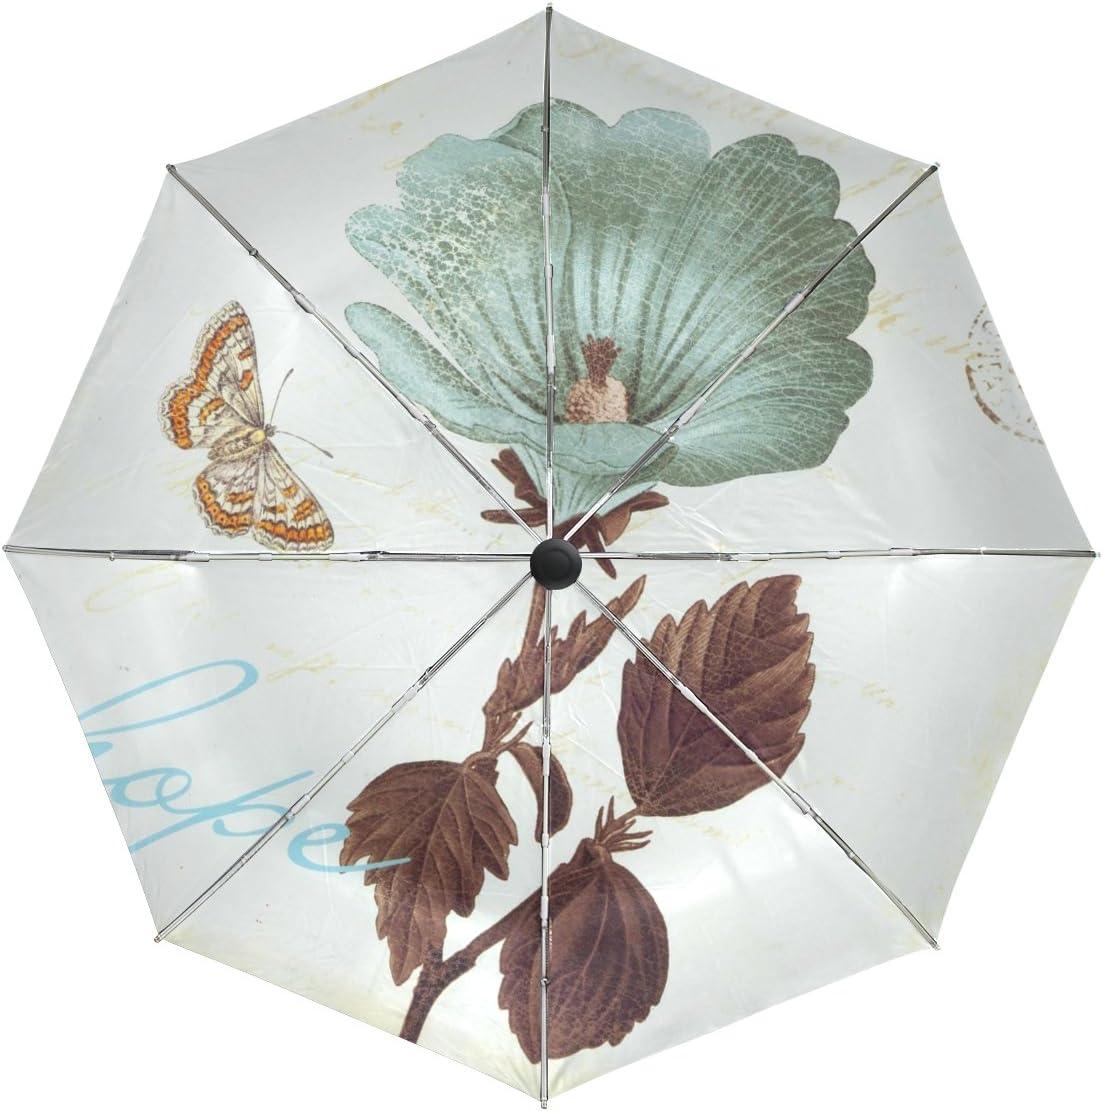 baihuishop Tower Windproof Umbrellas Auto Los Angeles Ranking TOP20 Mall G Folding 3 Open Close